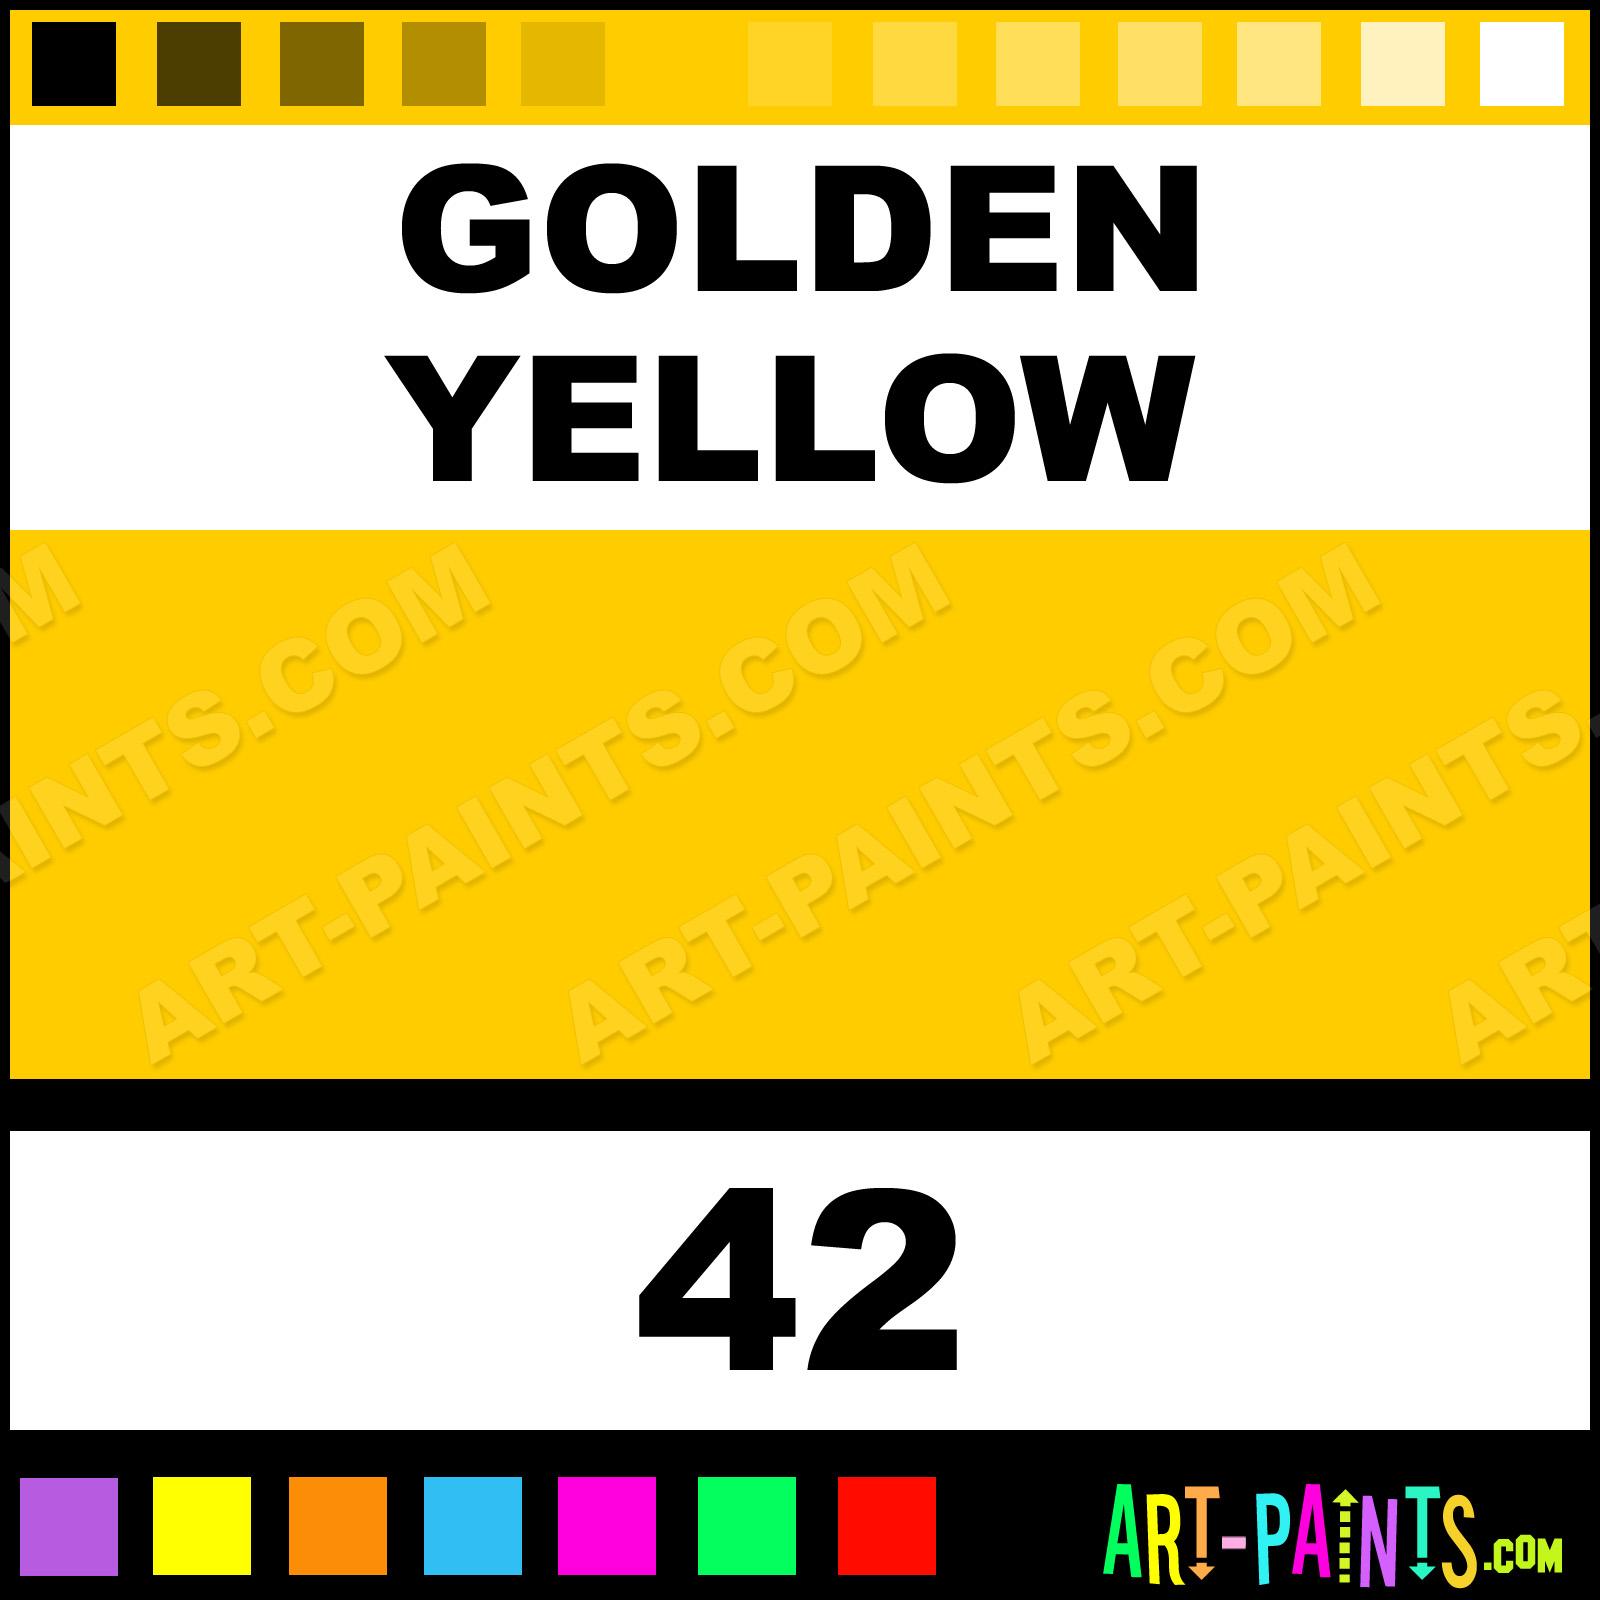 Golden yellow liquid fabric textile paints 42 golden yellow golden yellow paint nvjuhfo Images